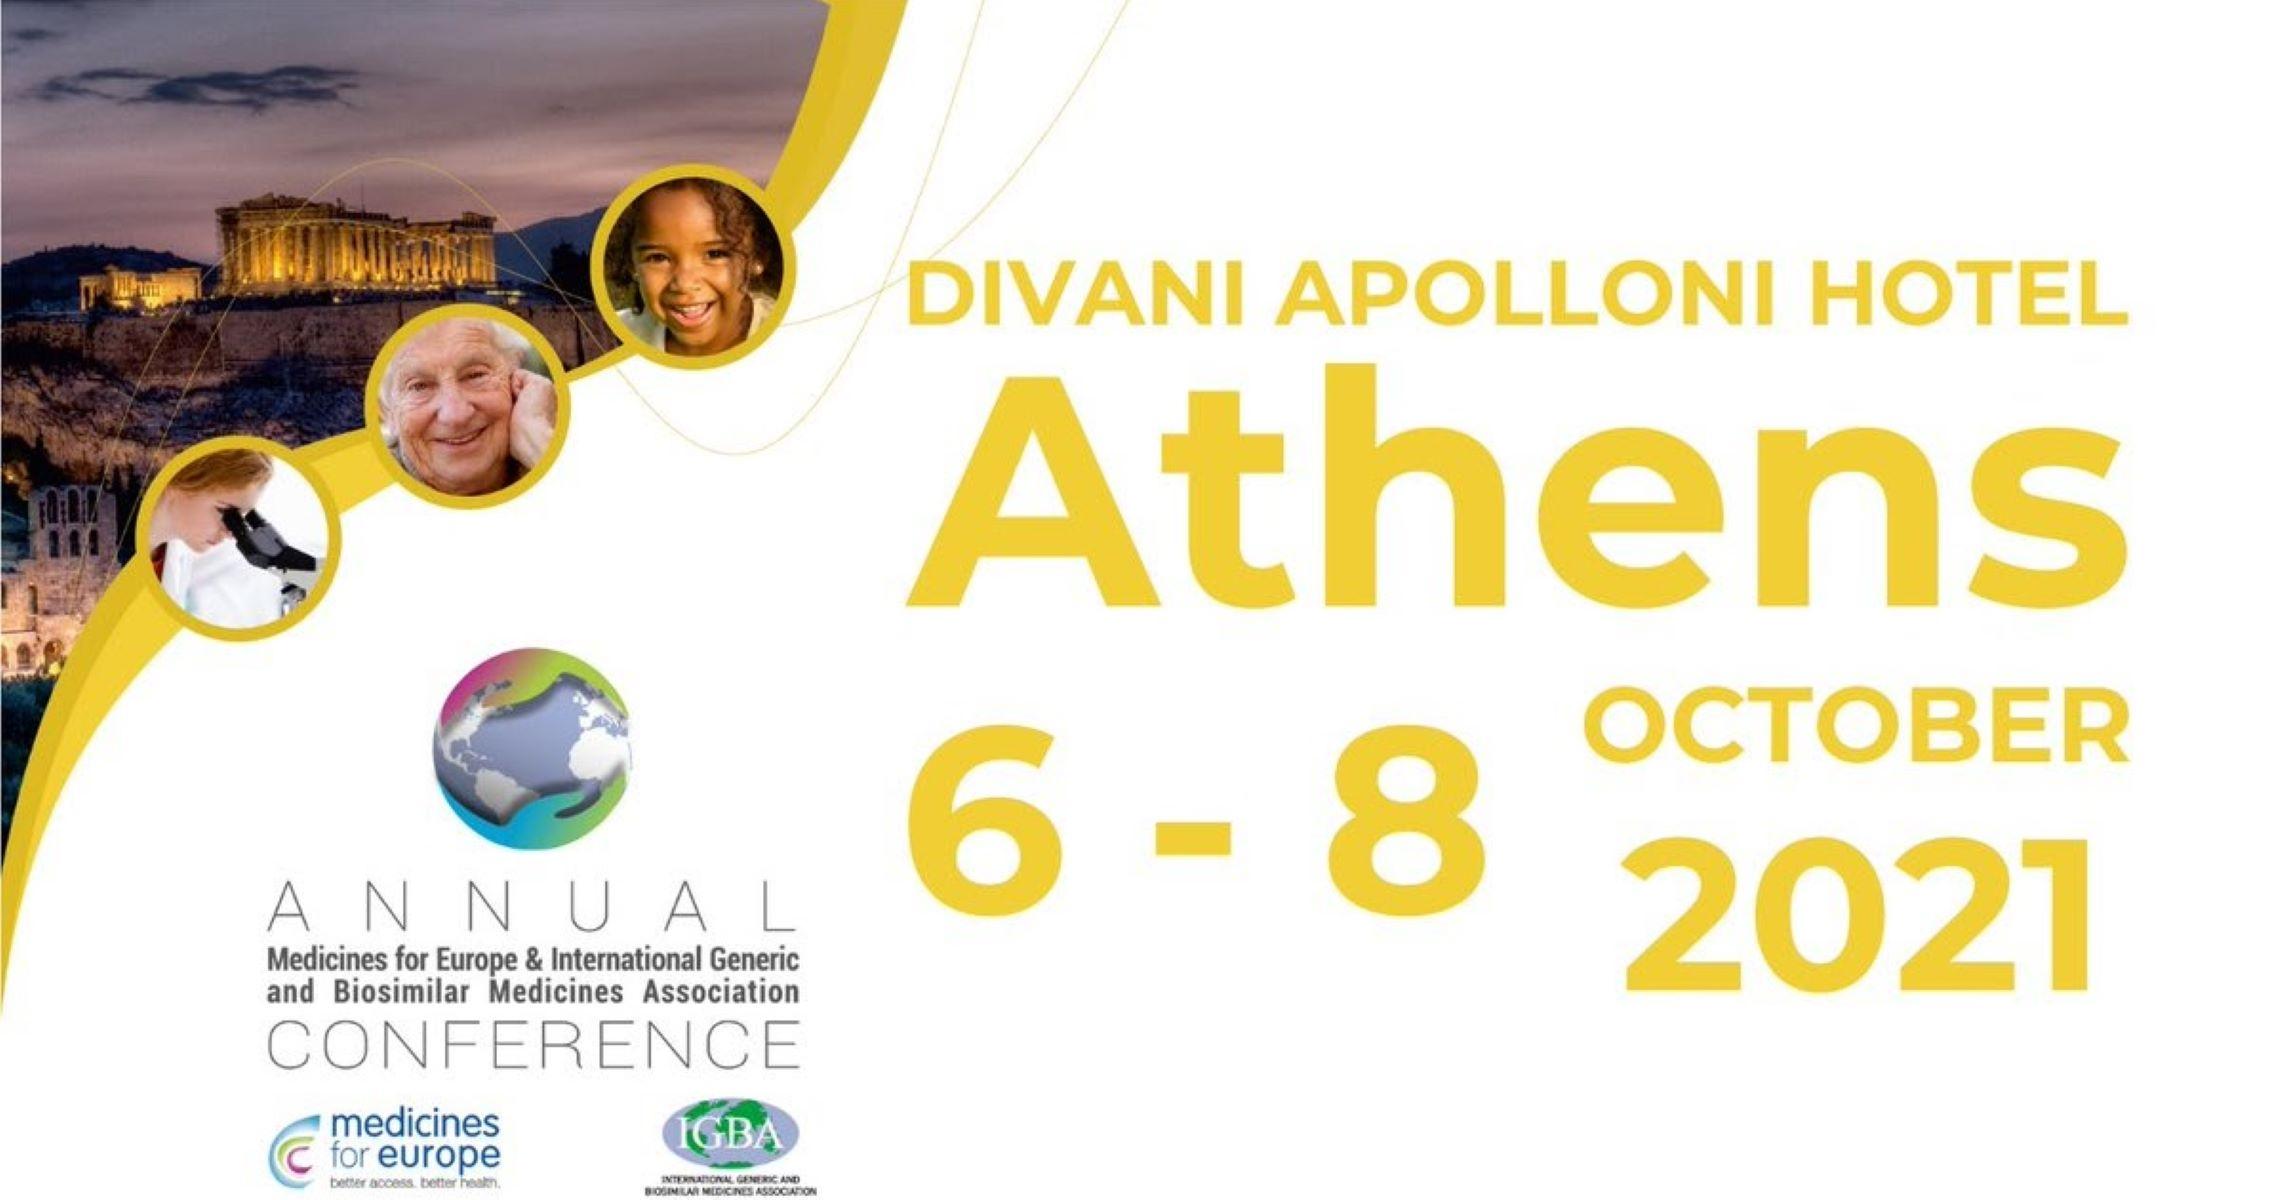 Medicines for Europe: Το διεθνές συνέδριο της ευρωπαϊκής φαρμακοβιομηχανίας στην Αθήνα